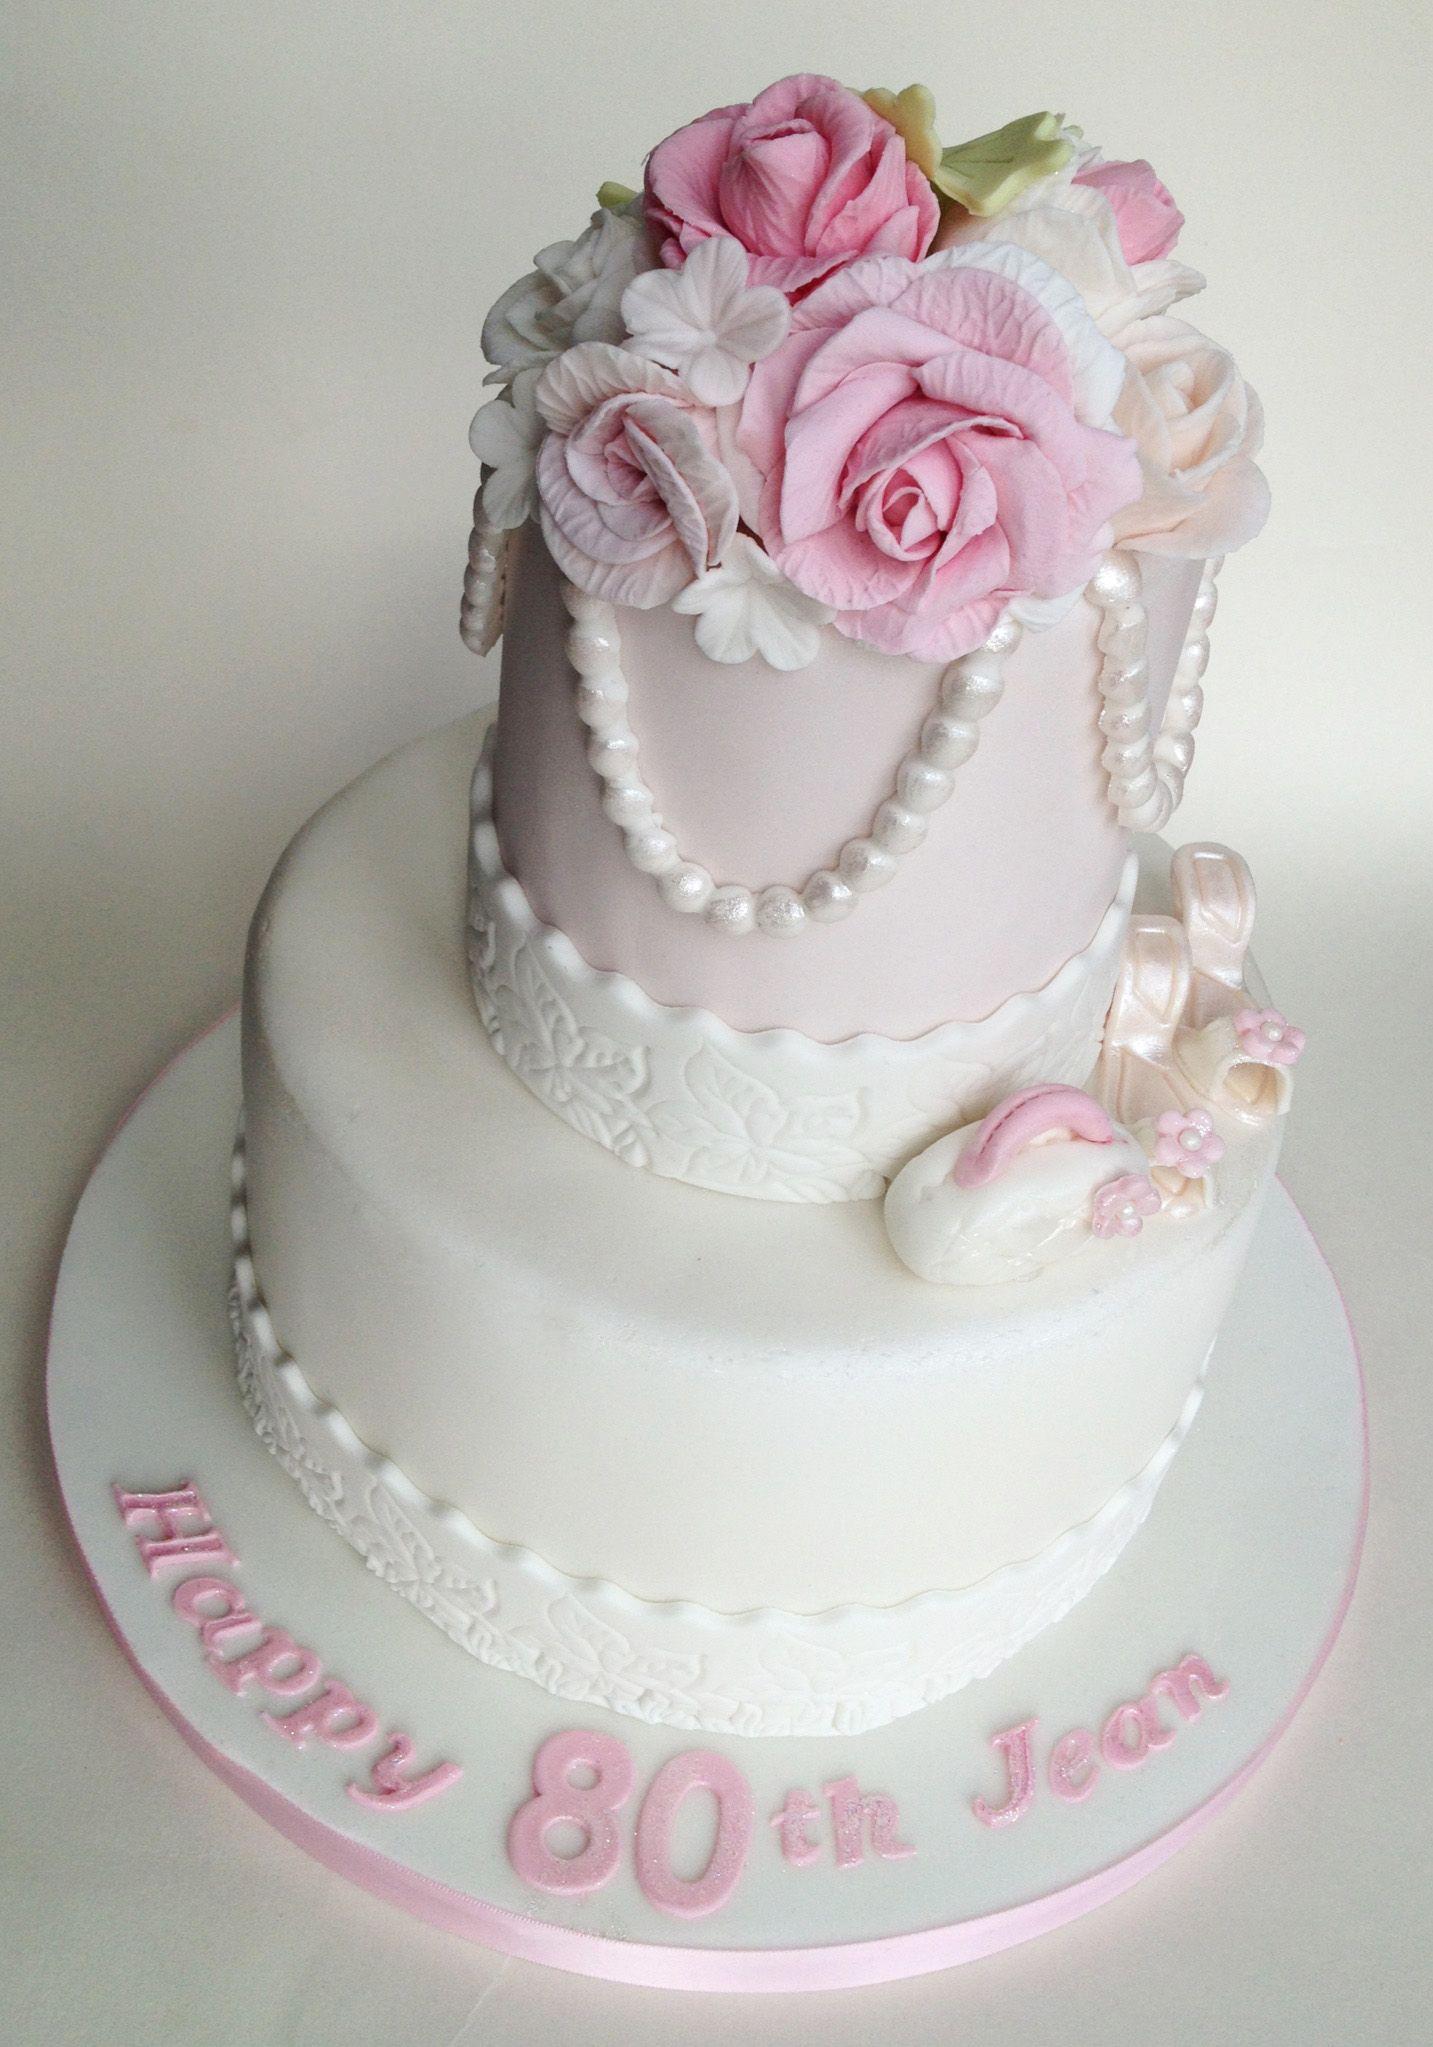 80th Birthday Cake 2 Tier 80th birthday party Pinterest 80th